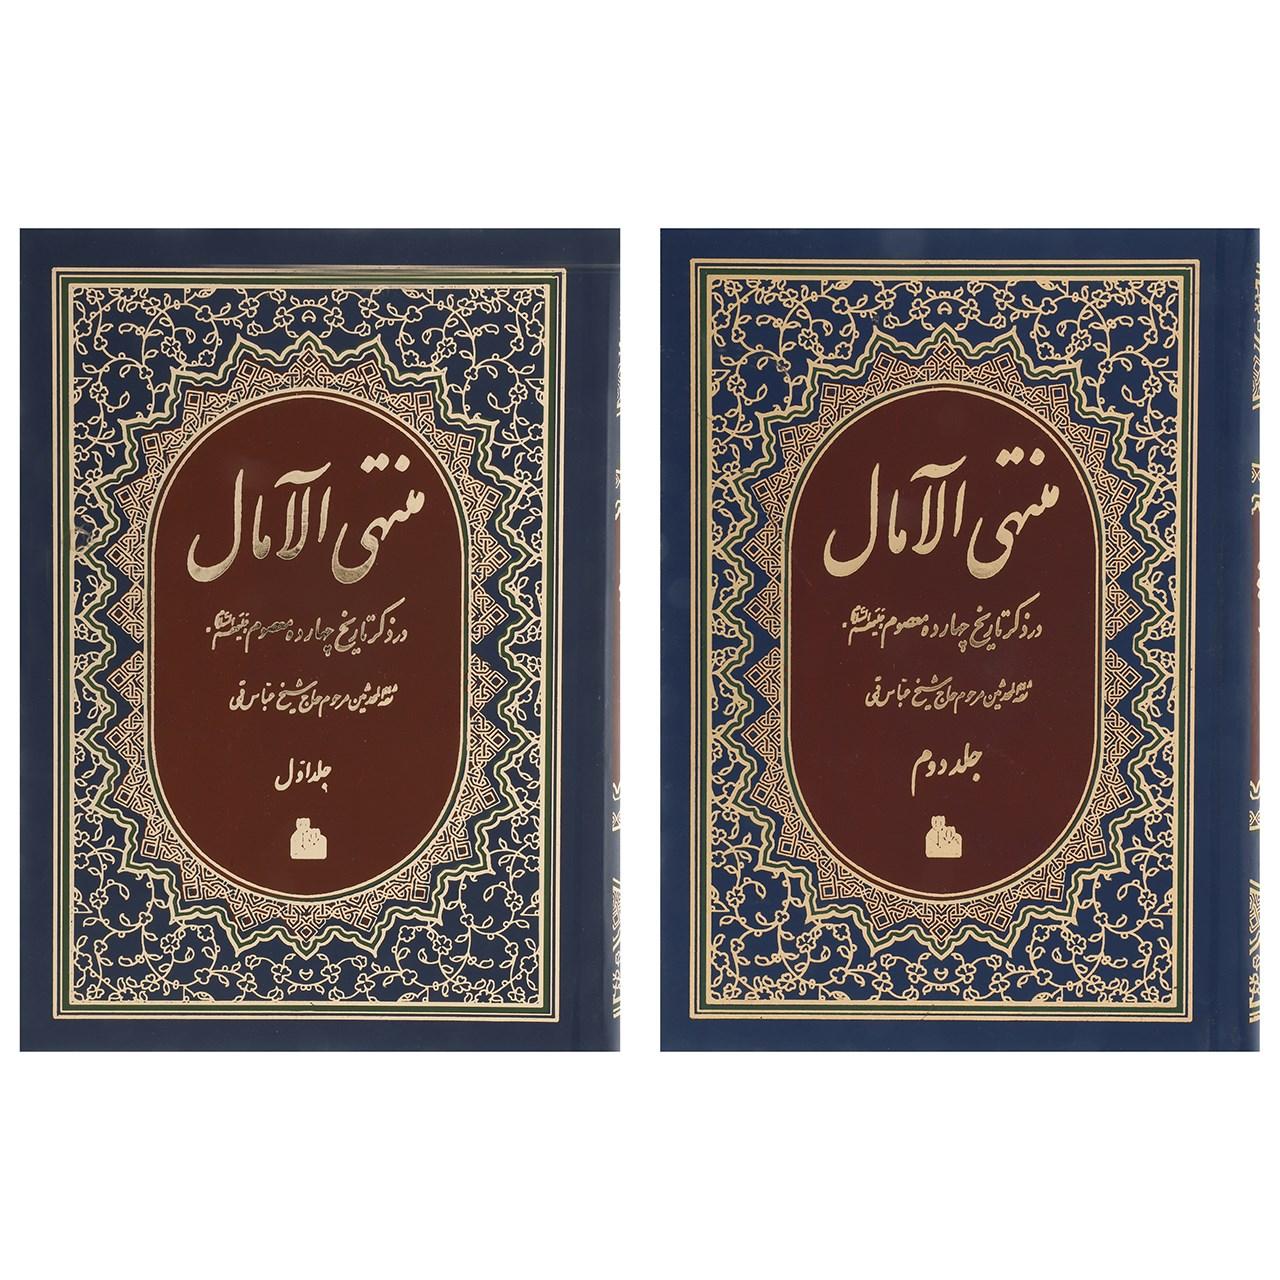 خرید                      کتاب منتهی الآمال اثر عباس قمی - دو جلدی